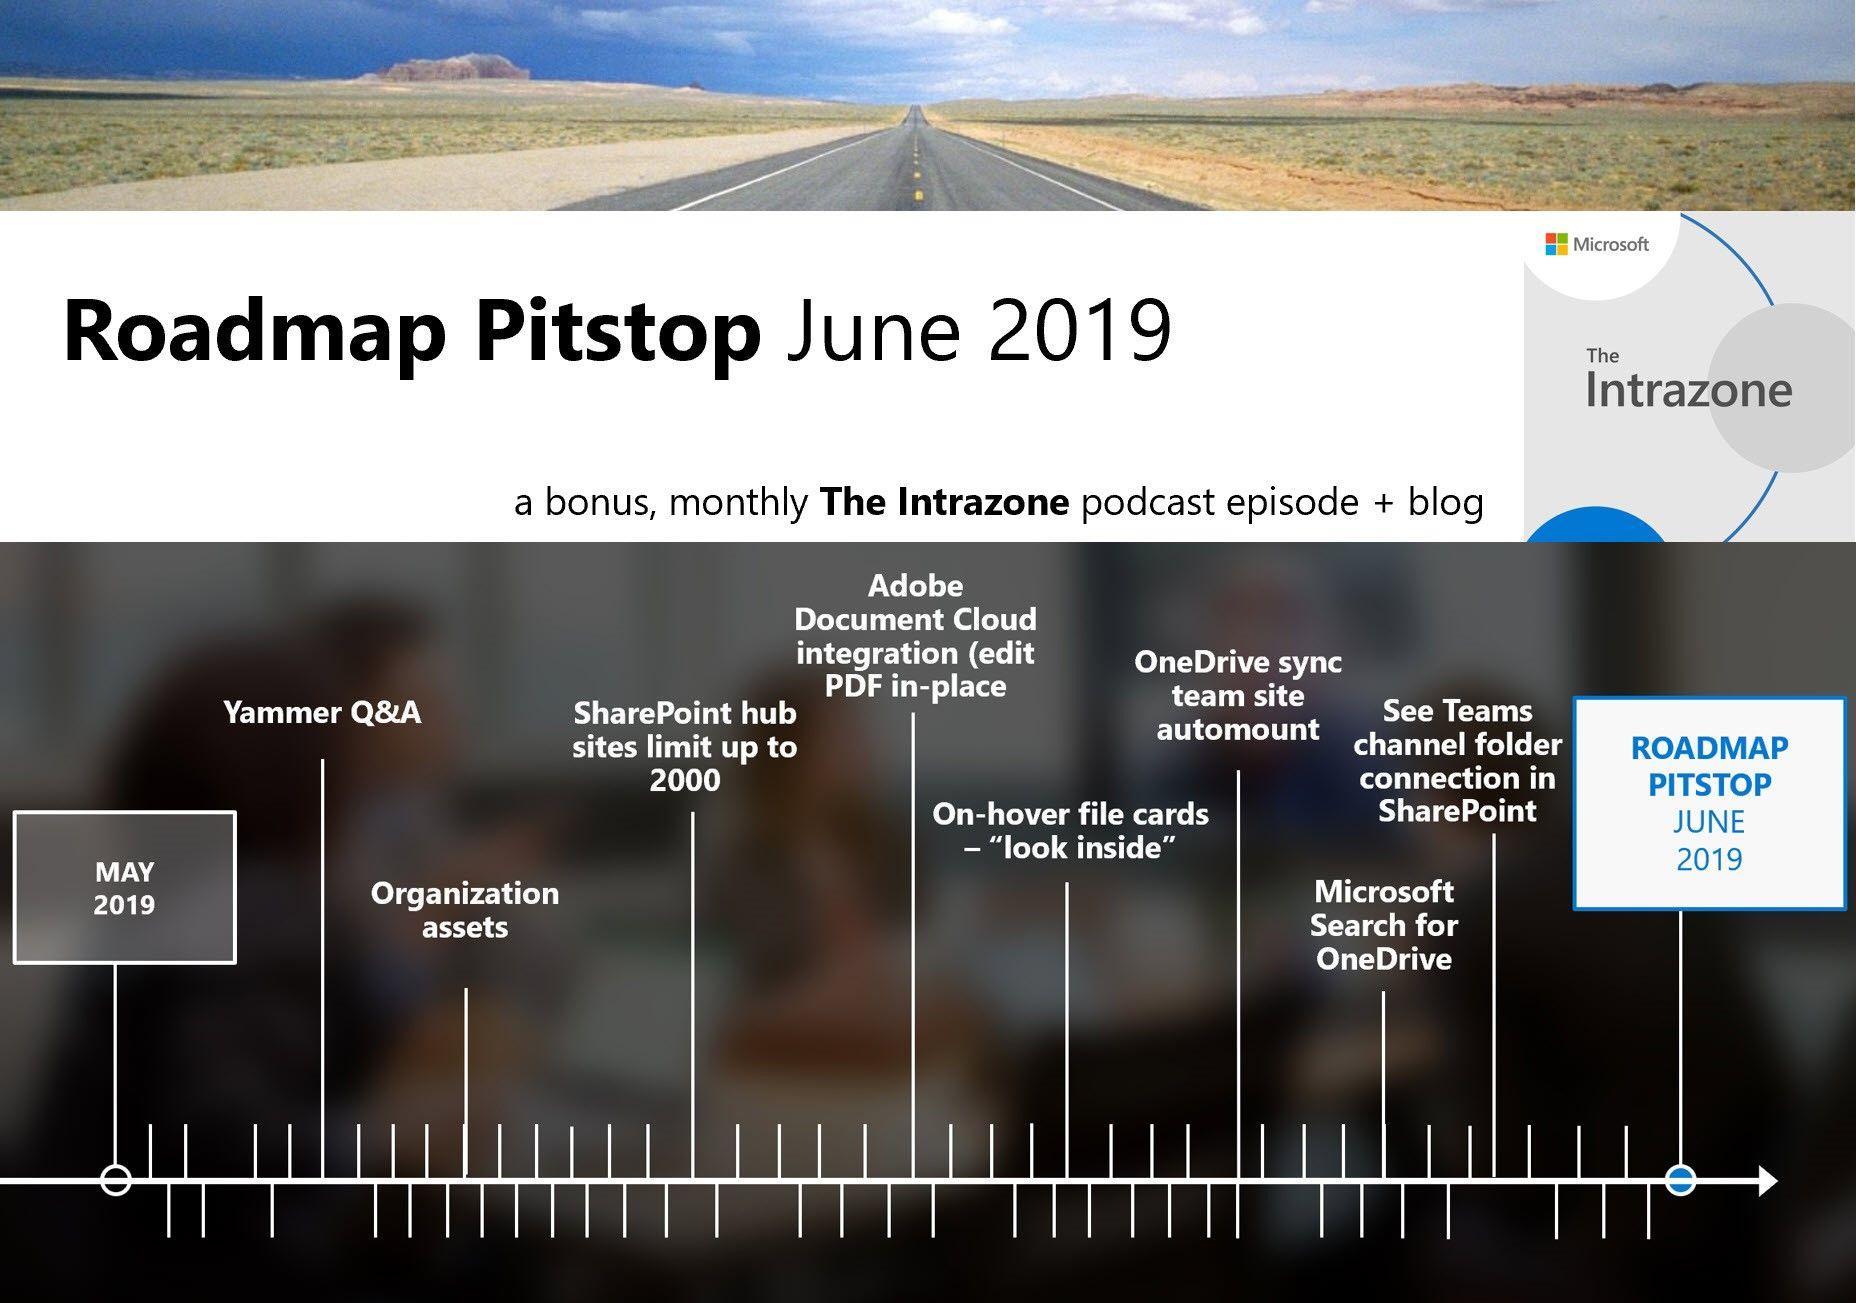 SharePoint Roadmap Pitstop June 2019